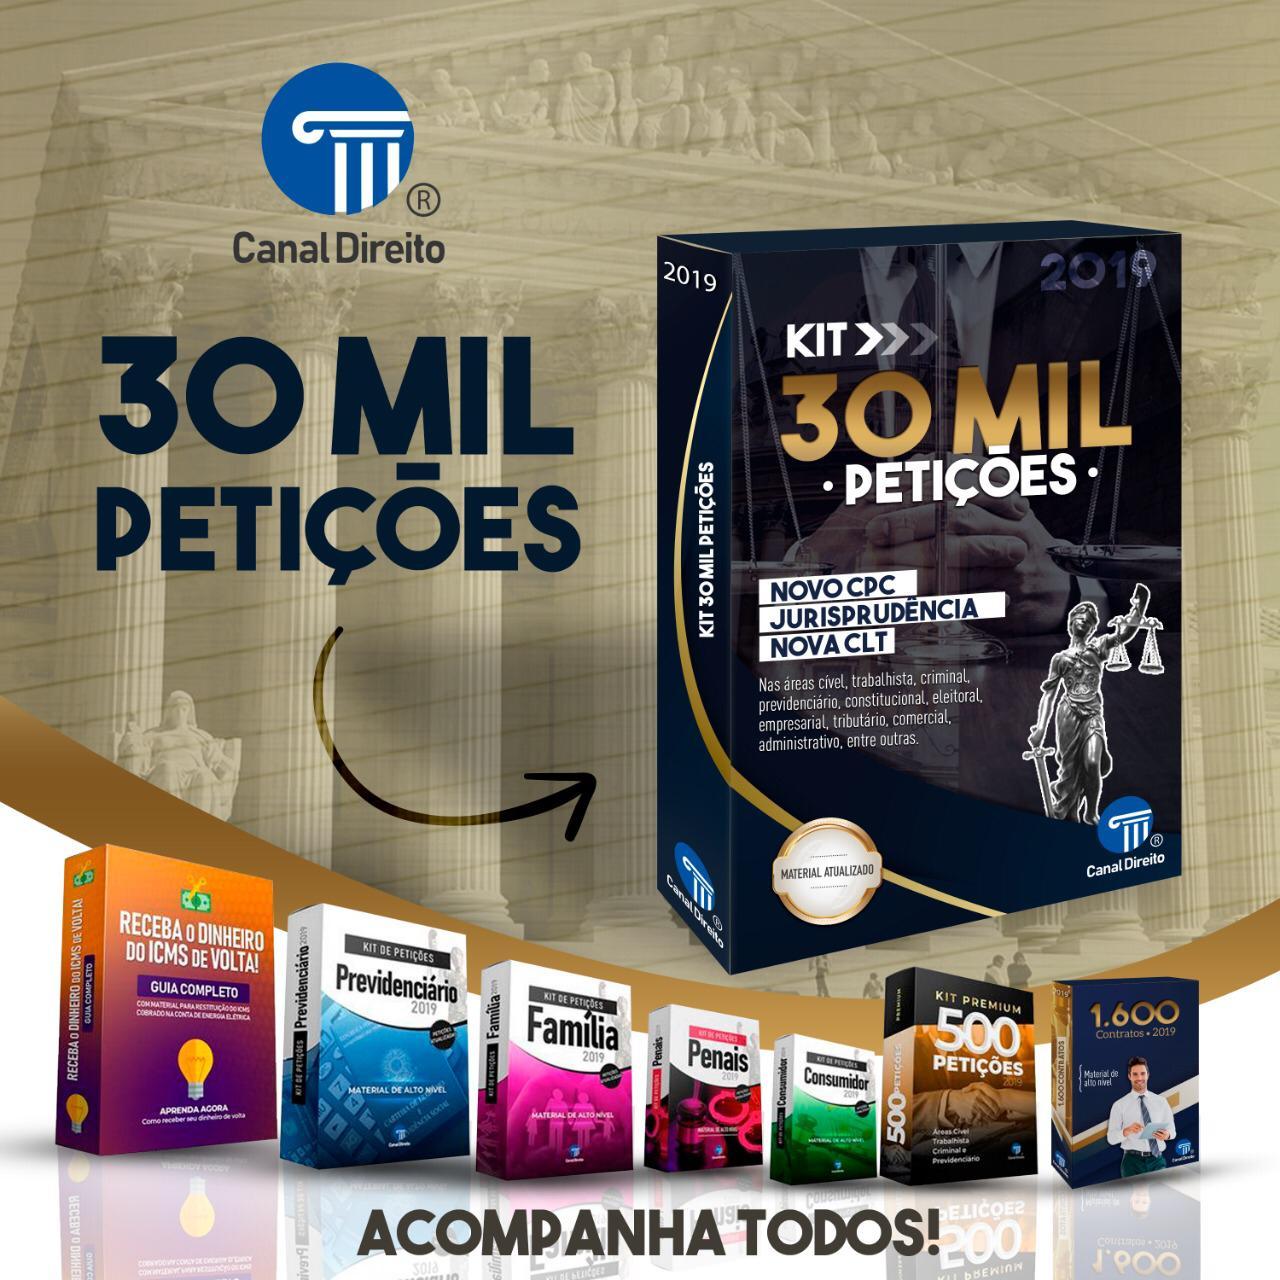 30 MIL PETIÇÕES - CANAL DIREITO - VERSÃO PREMIUM 1.0